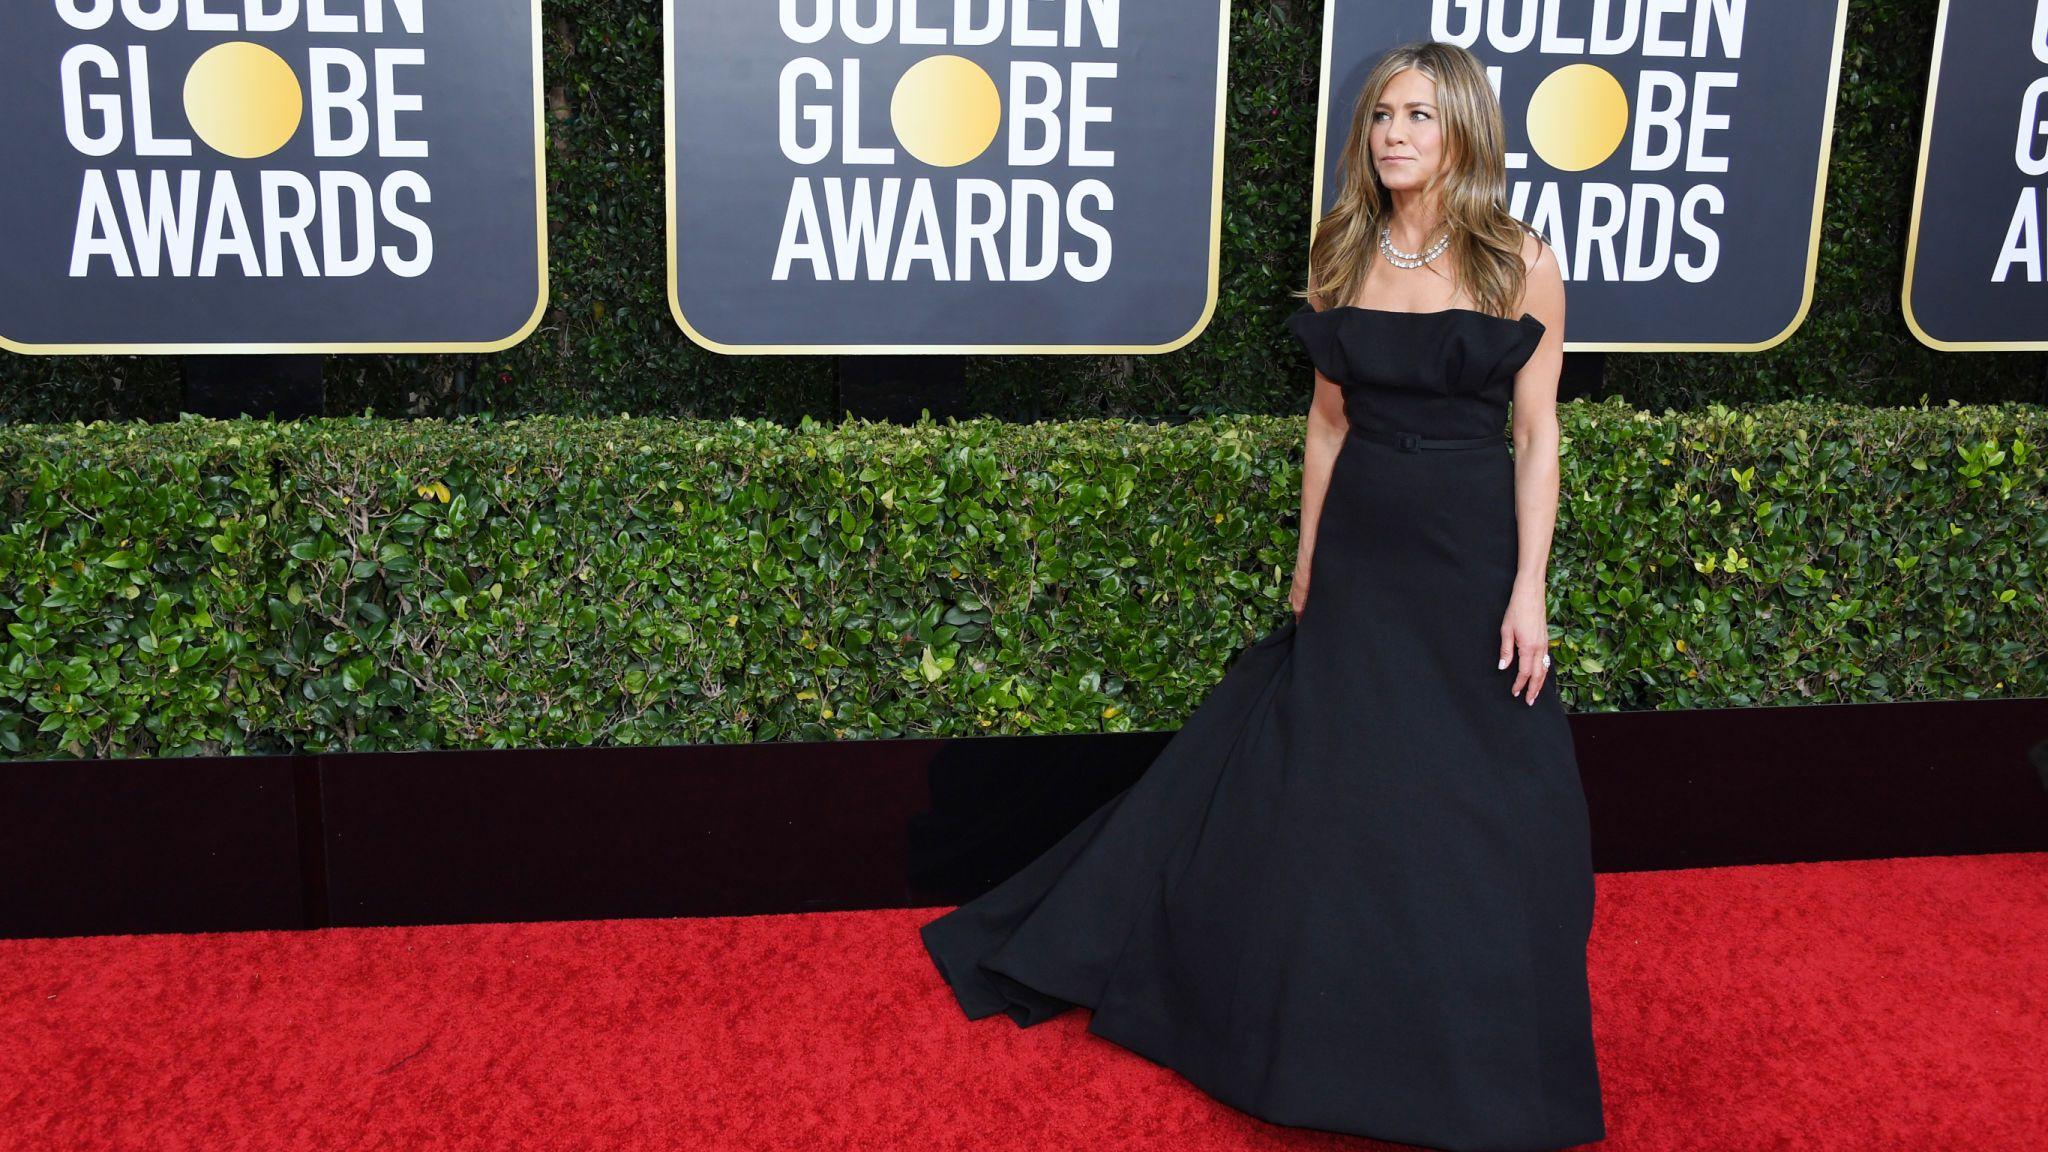 Jennifer Aniston at the Golden Globes 2020